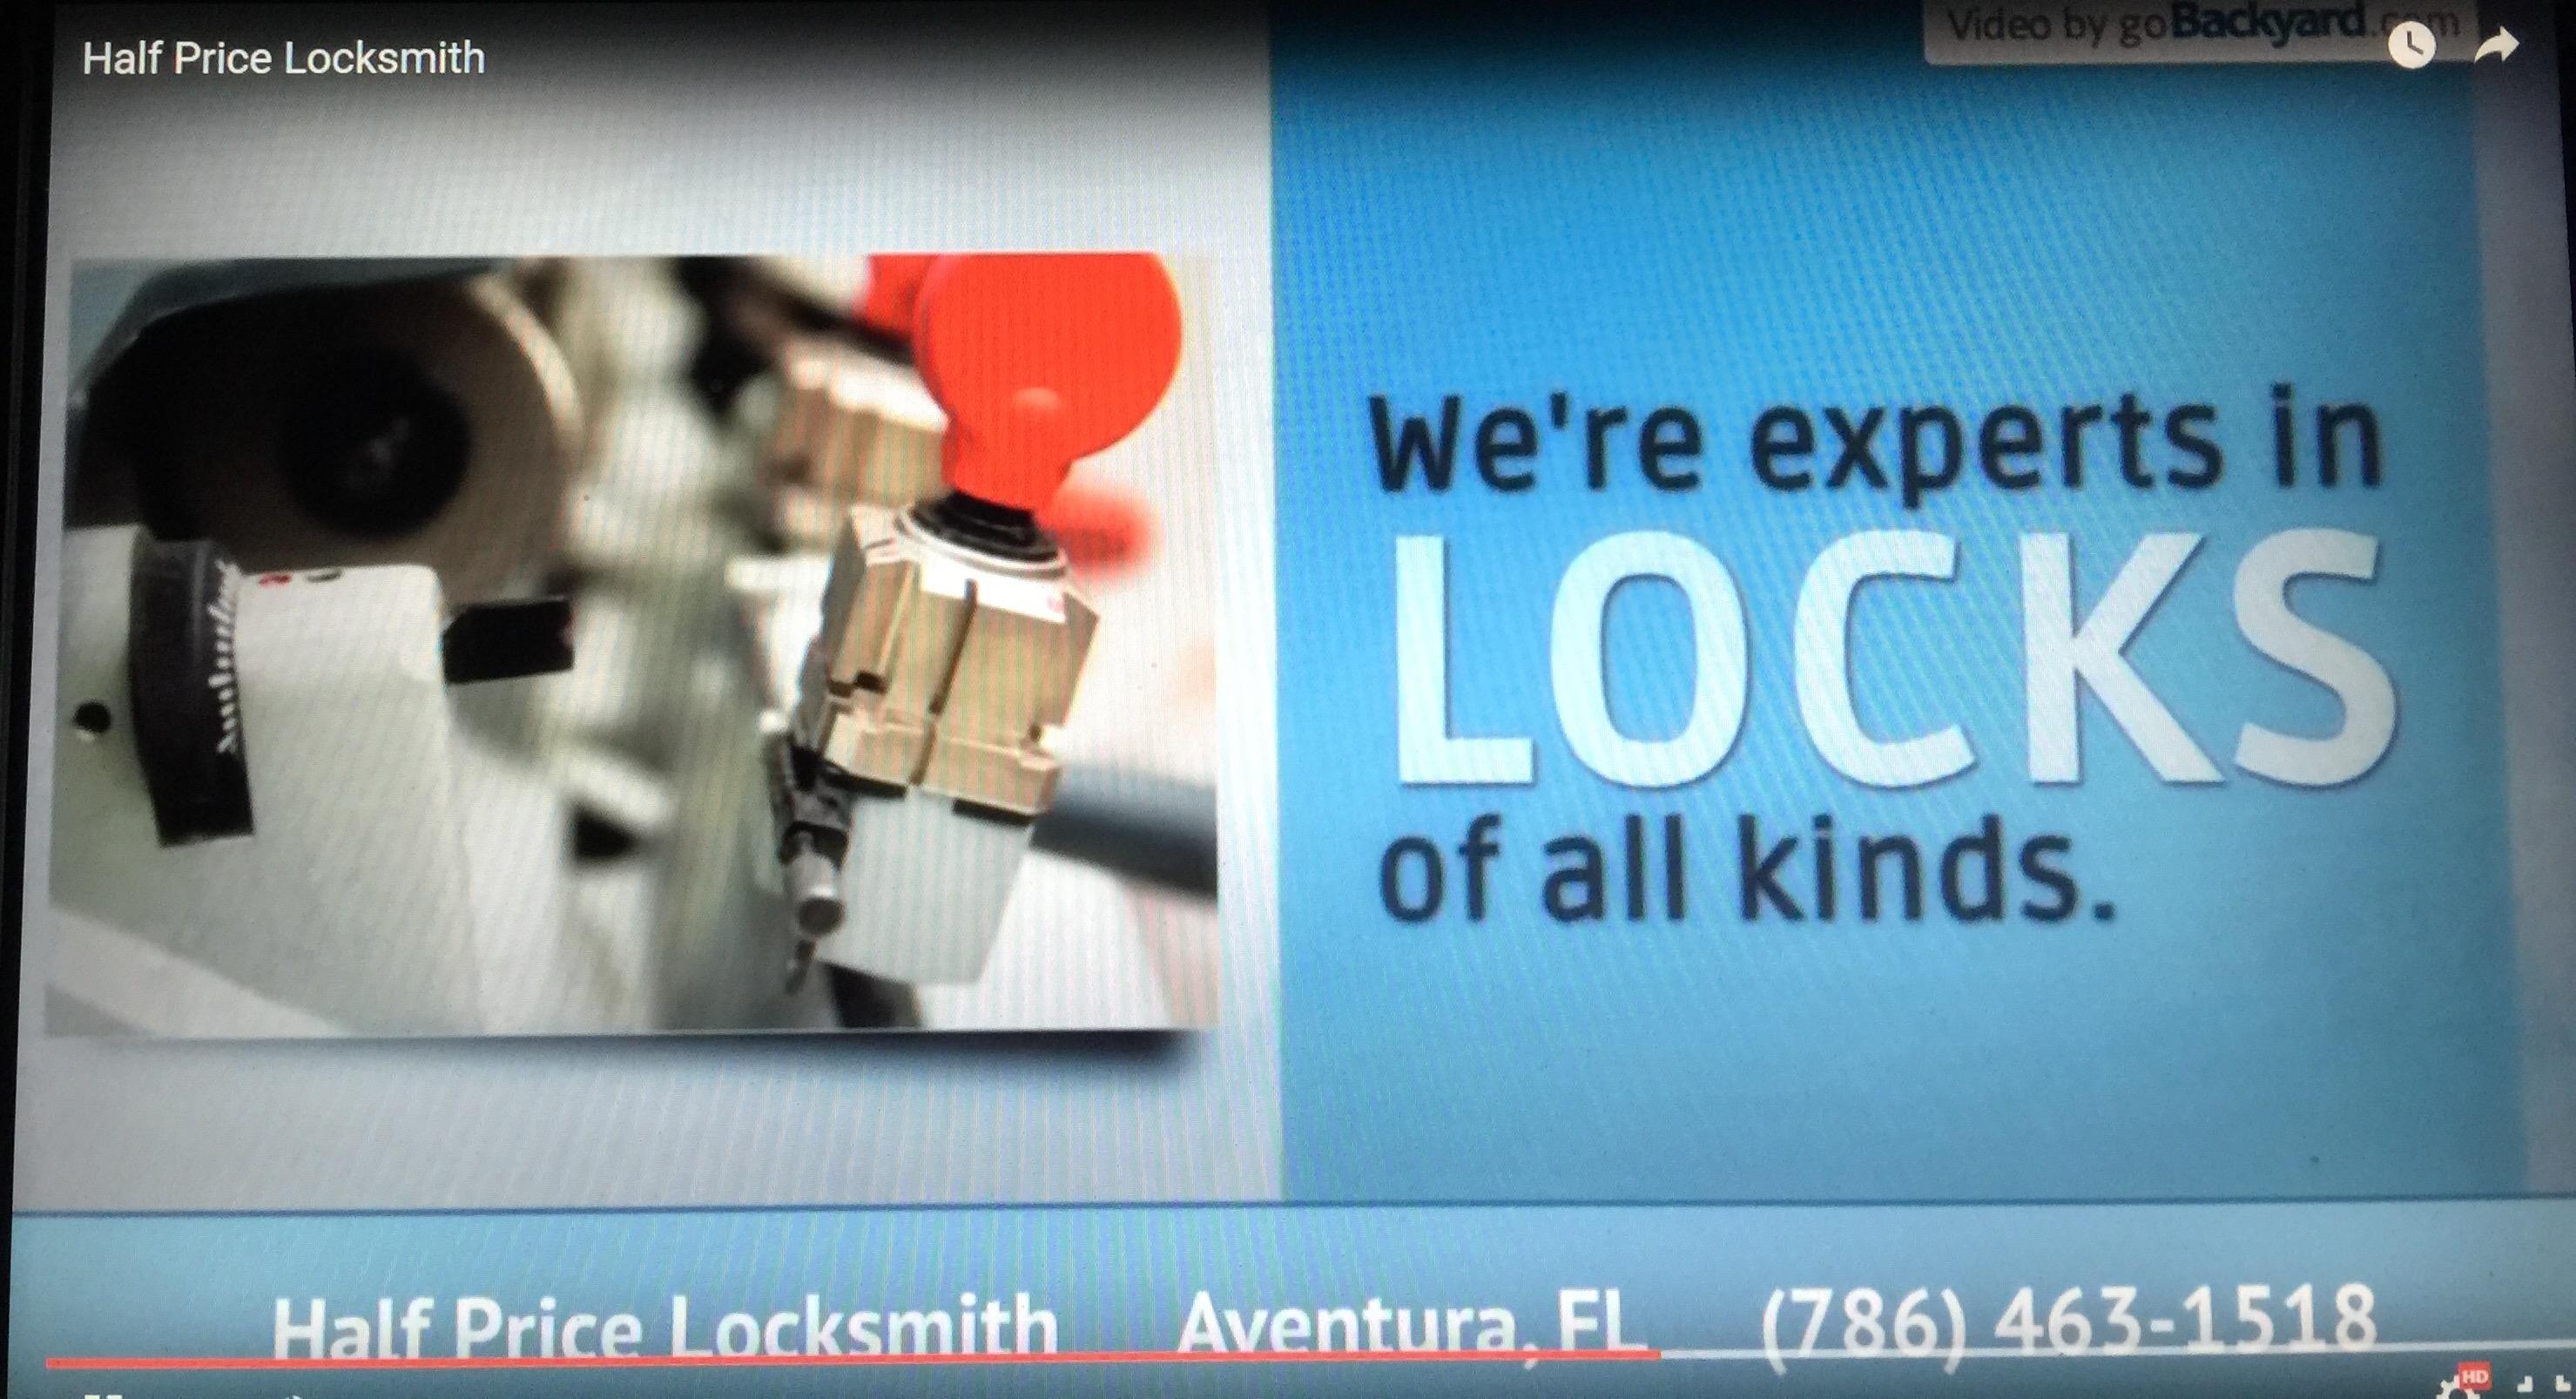 Half Price Locksmith image 15